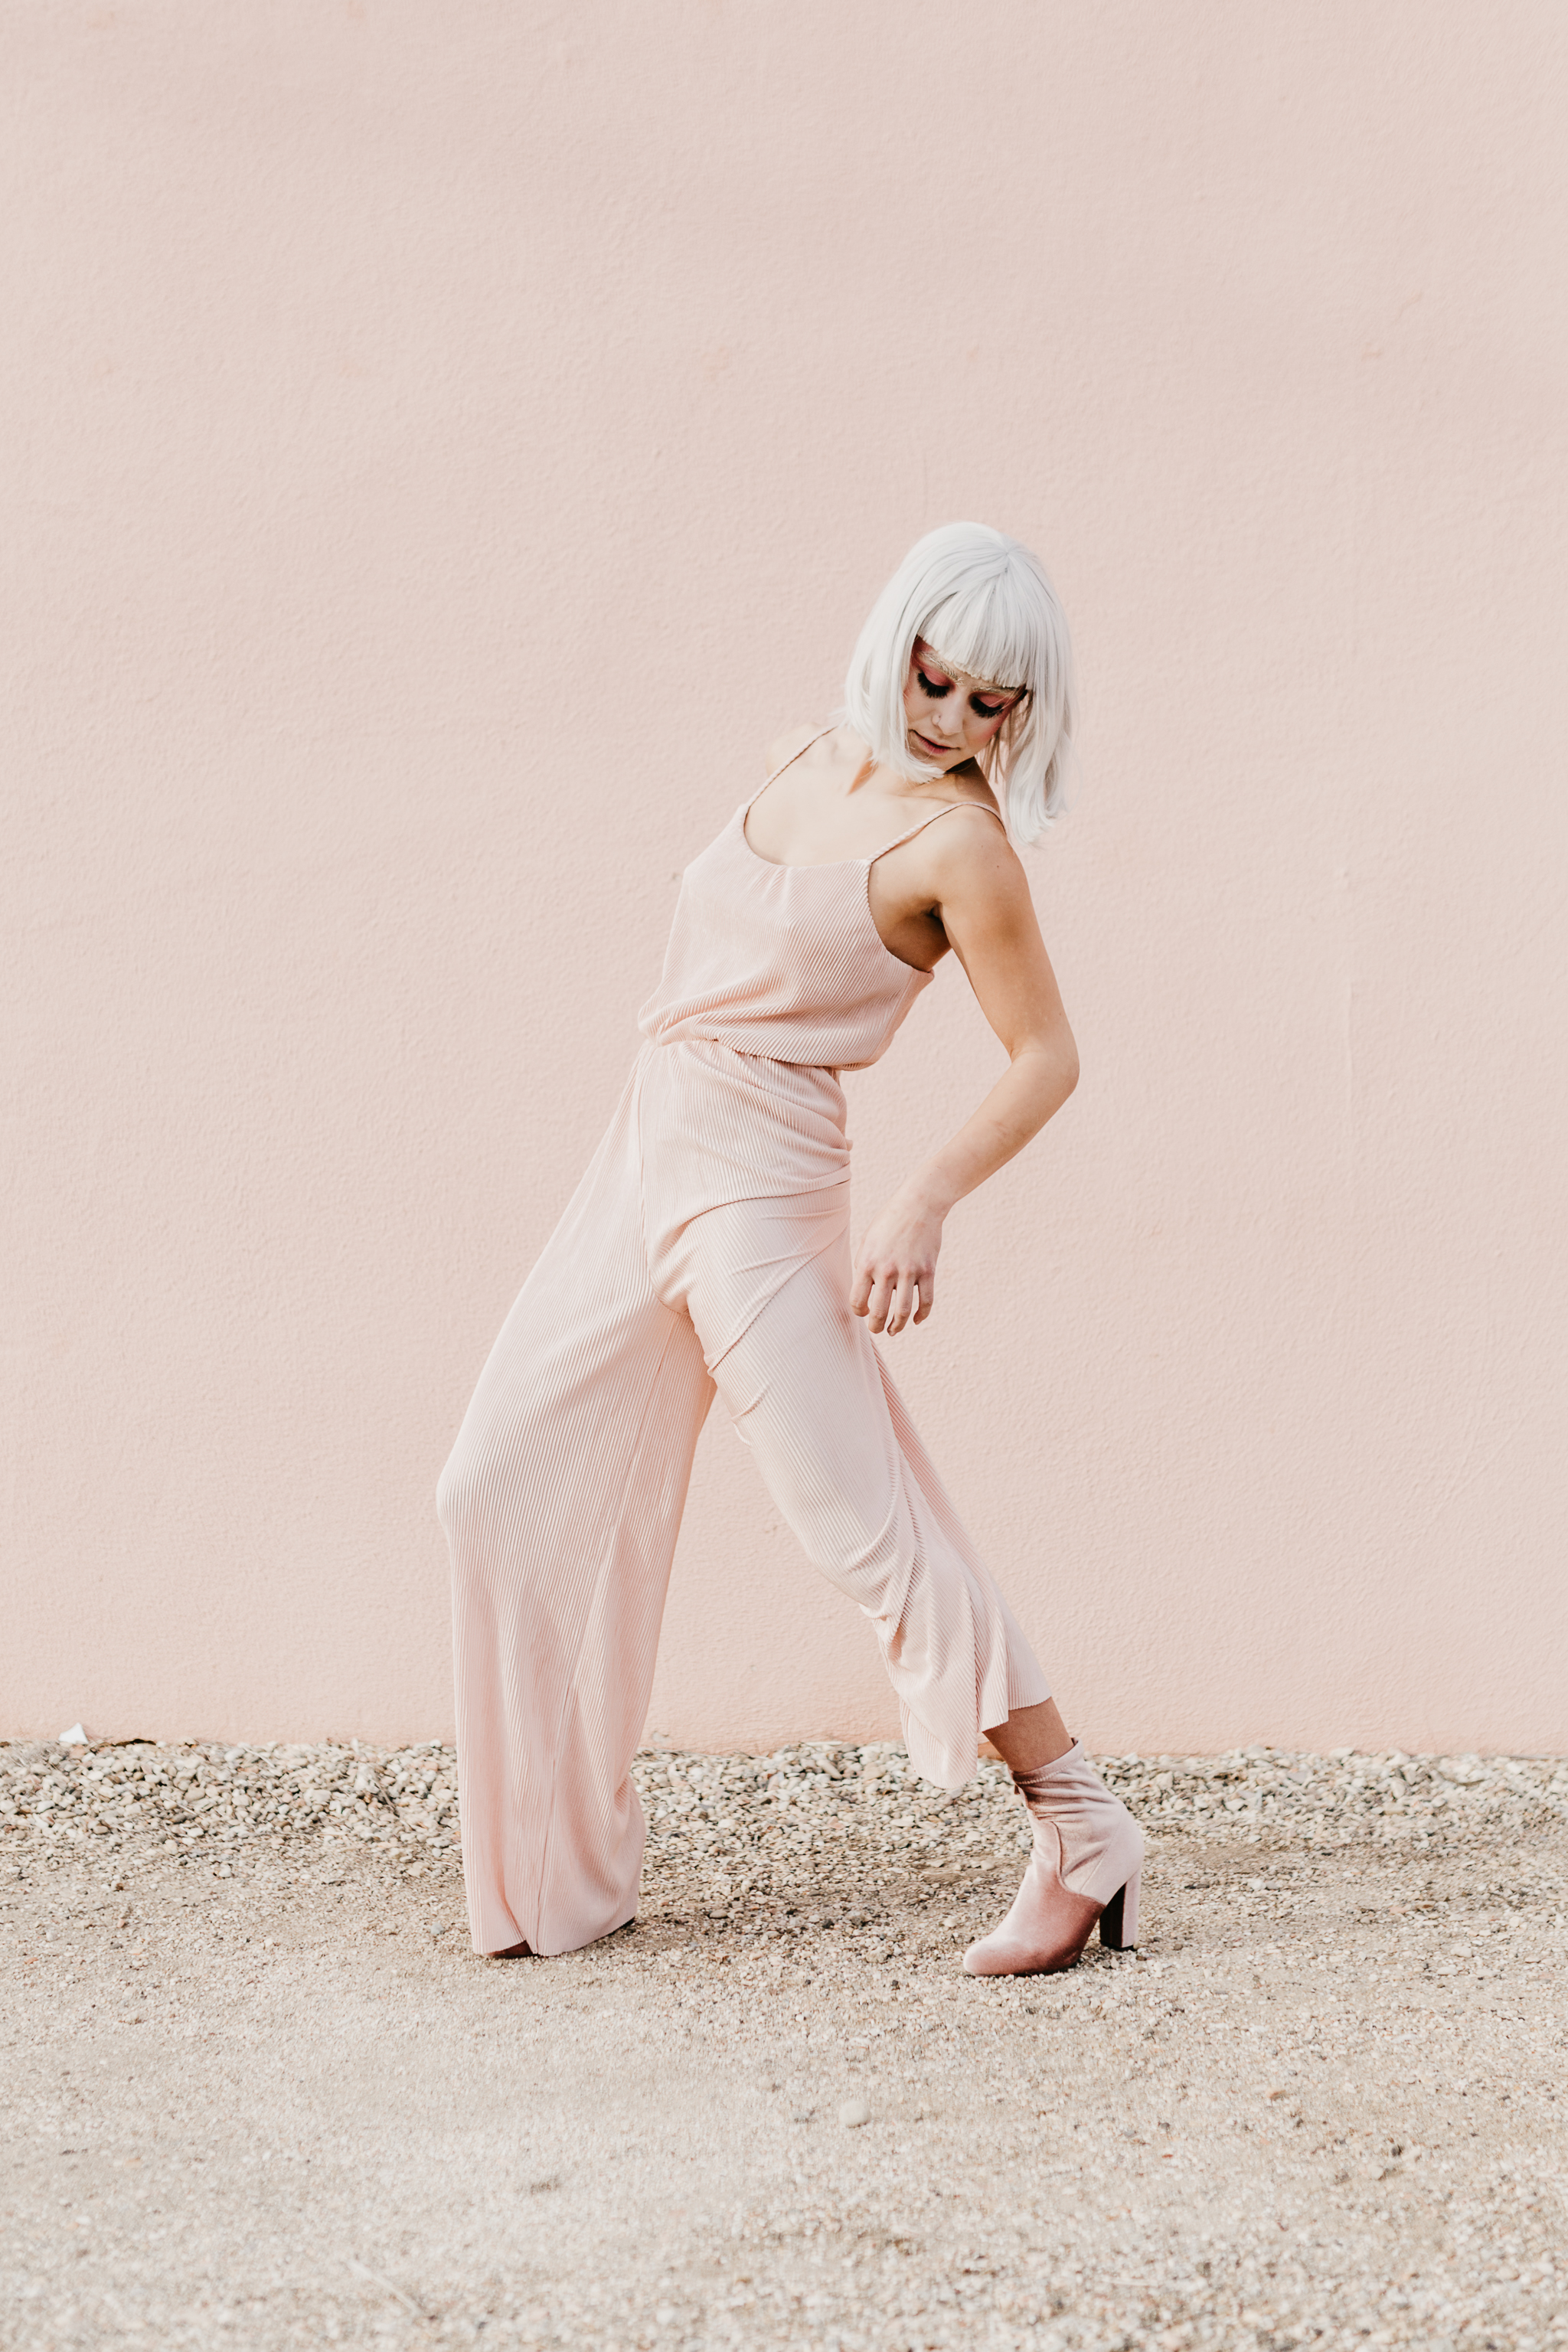 Heidi-Toevs-Forever-21-Fashion-Editorial-Photographer-San-Luis-Obispo-California